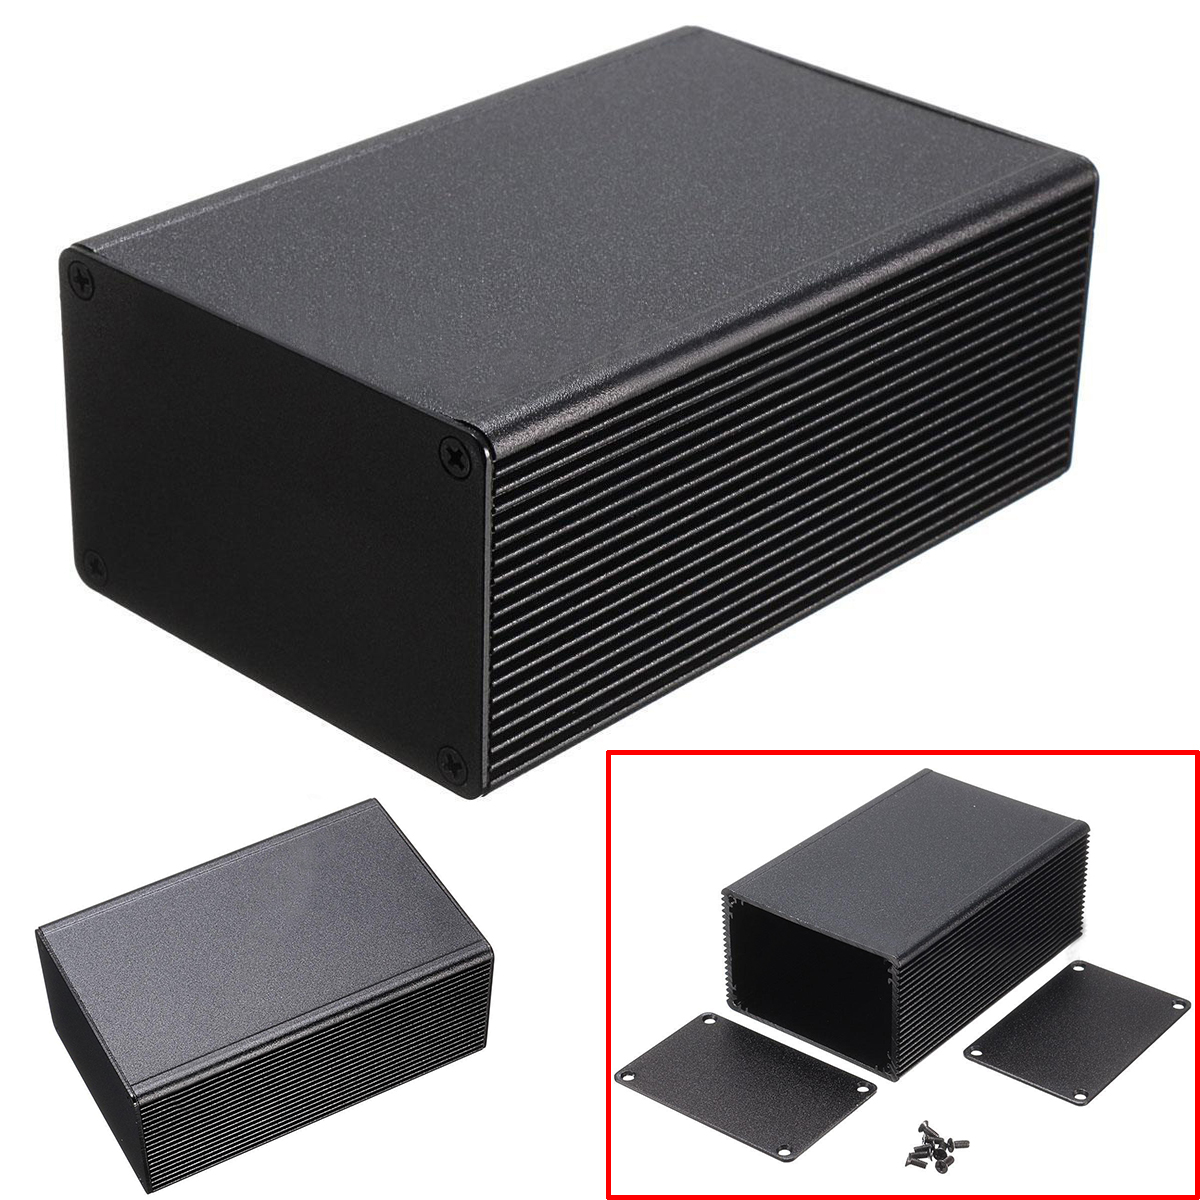 Aluminum Enclosure 100x66x43mm Aluminum Electronic Box Black PCB Instrument Meter Enclosure Case DIY Electronic Project Case|Connectors| |  - title=